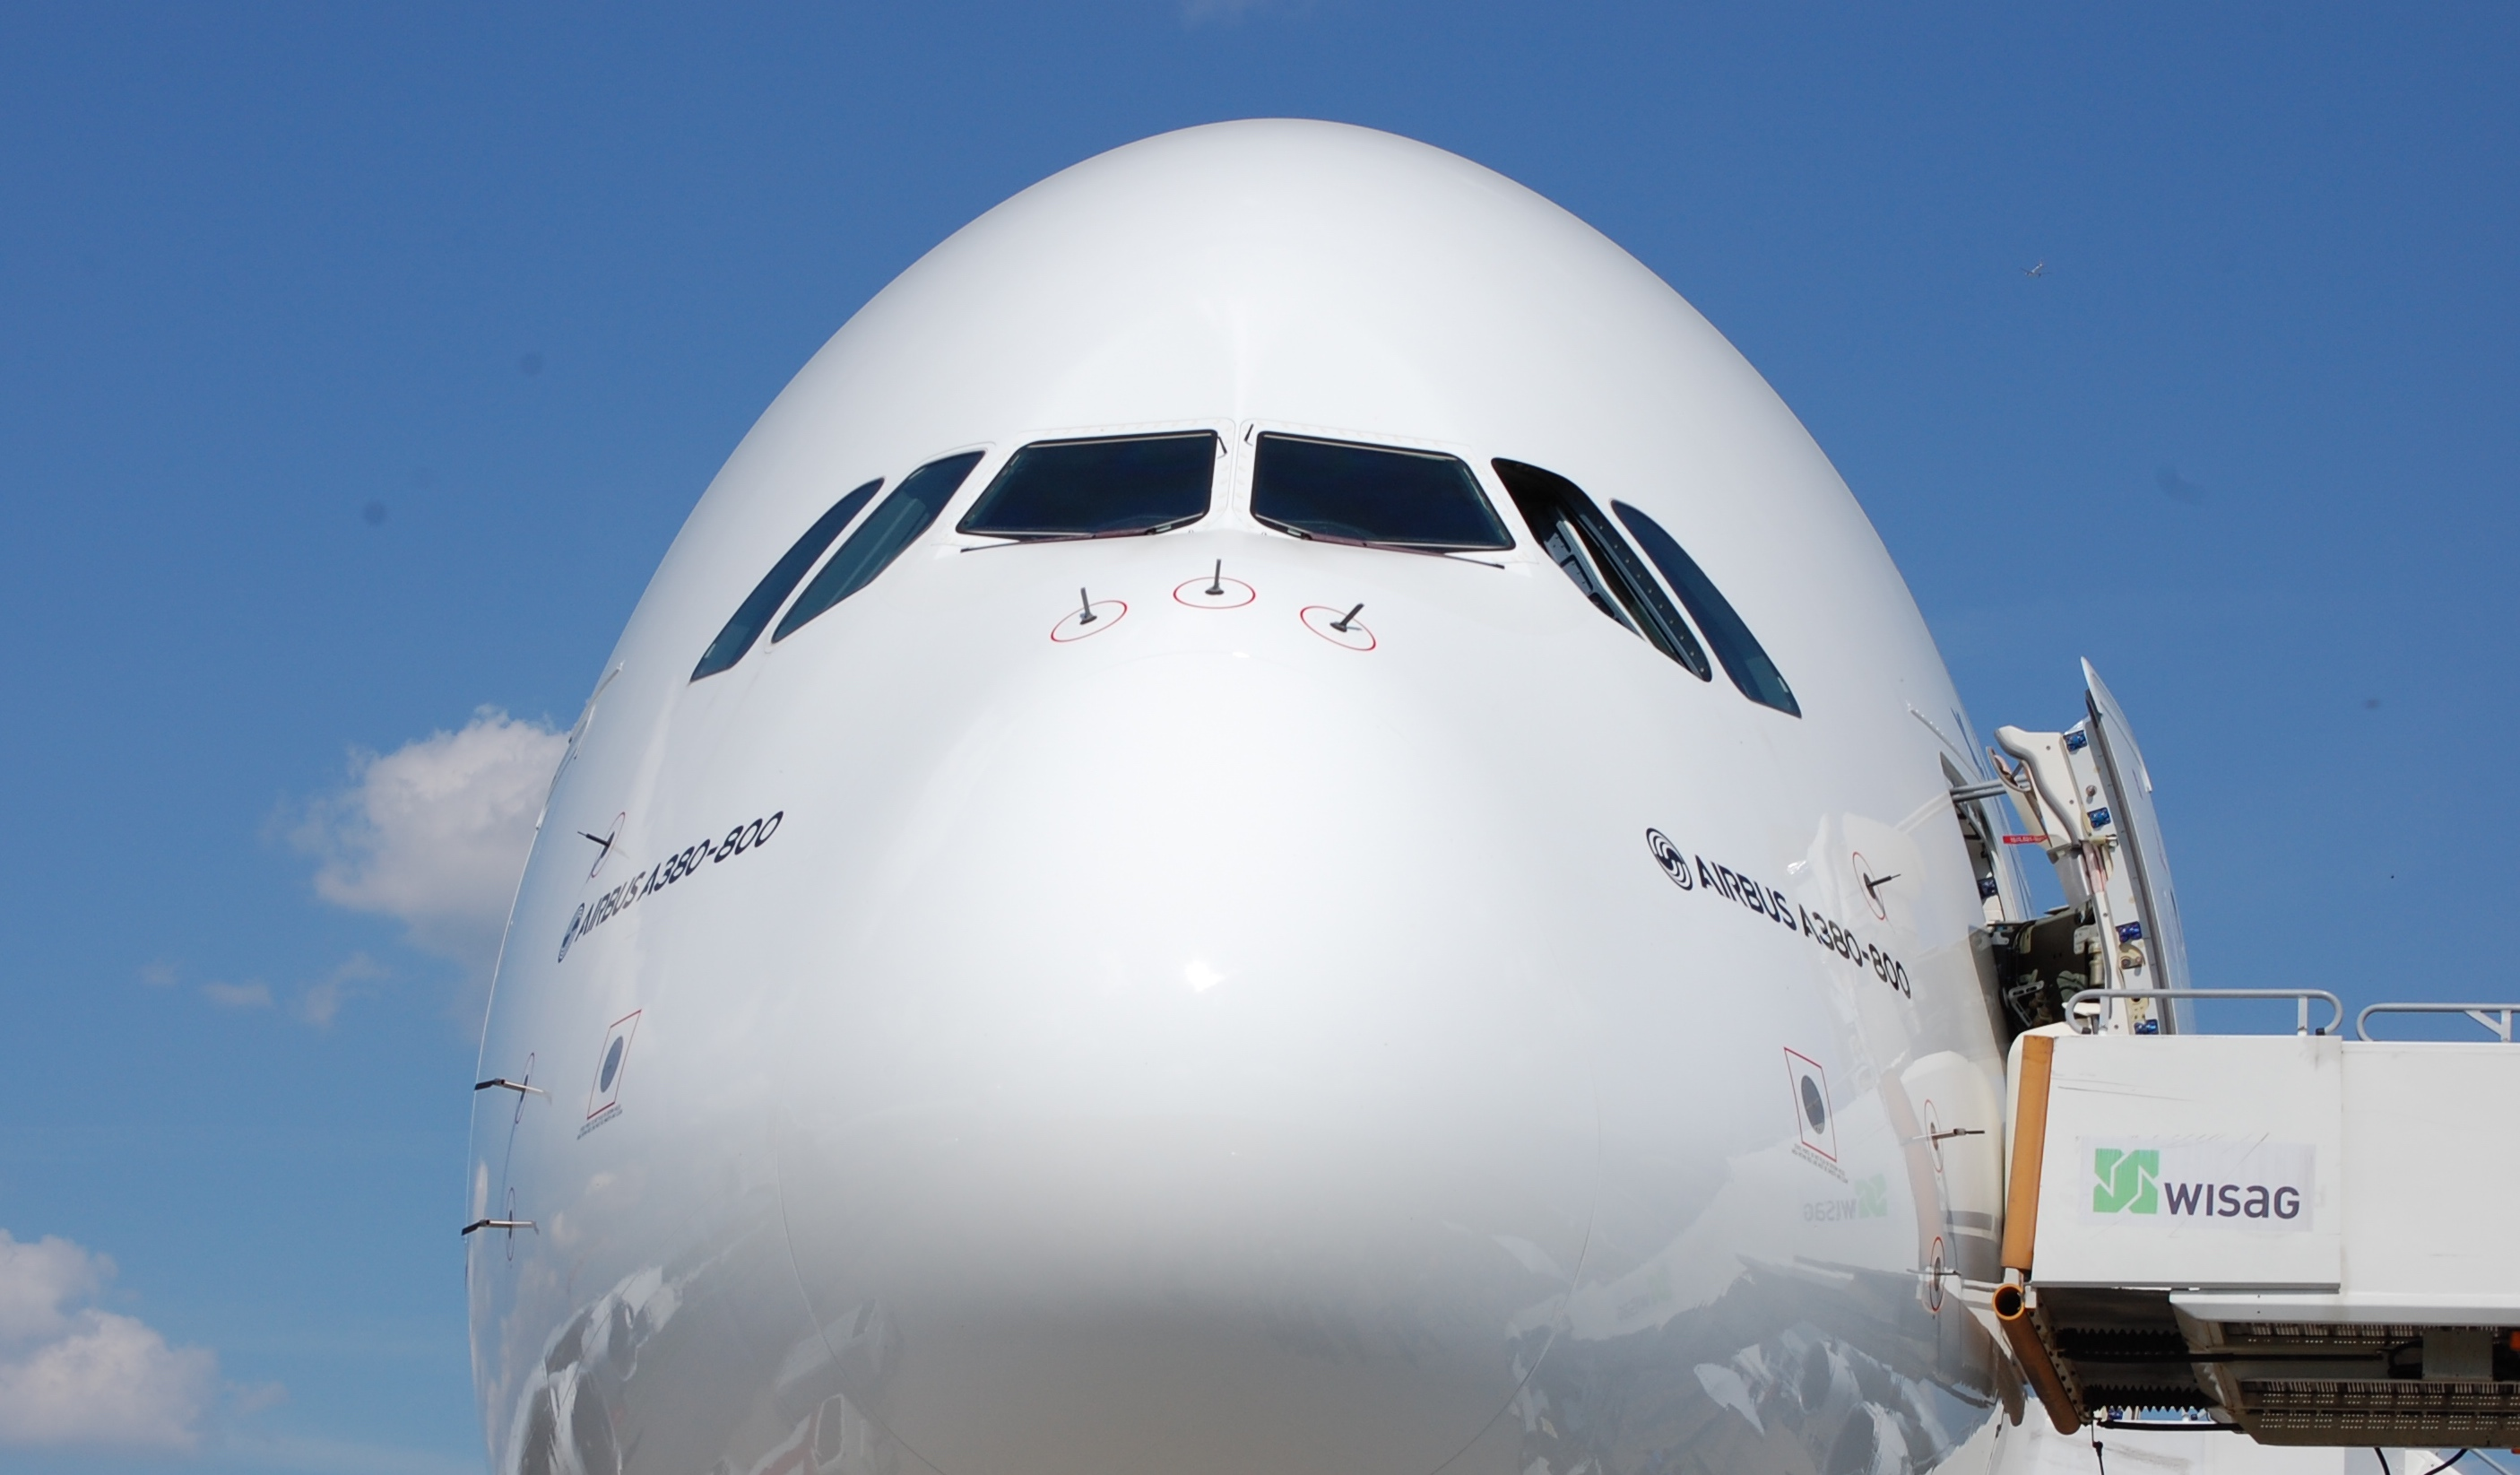 Asiana A380 nach Seoul ab 520€ von Frankfurt am Main!